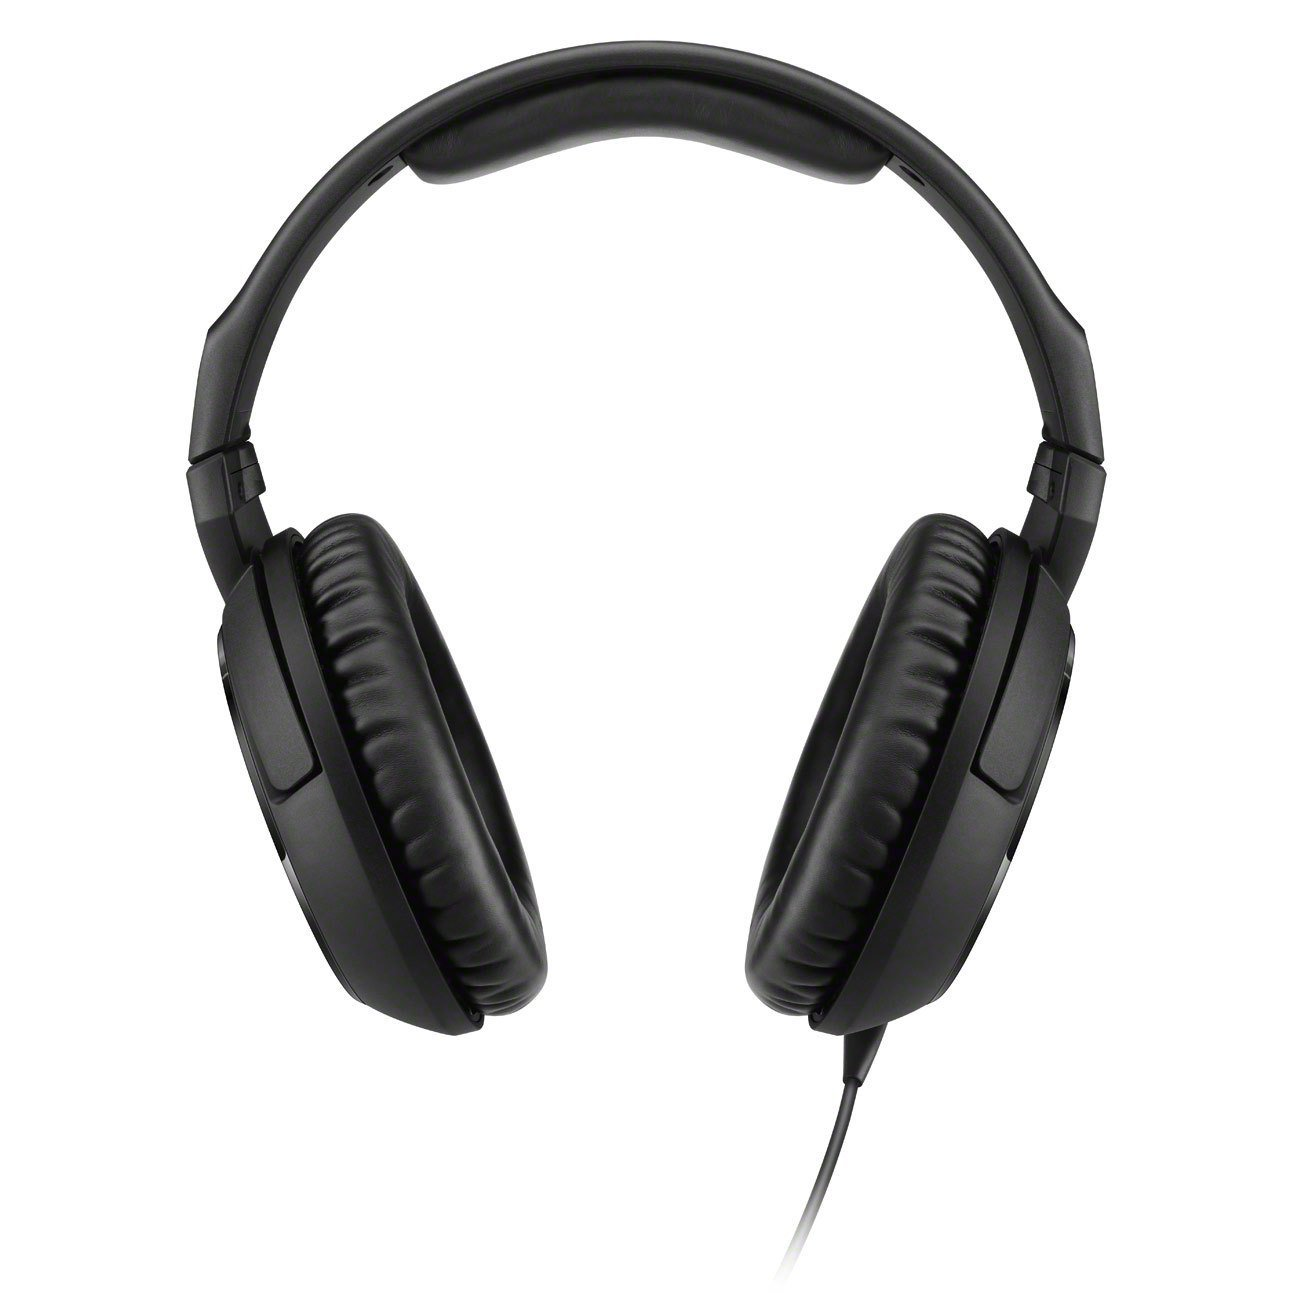 Studio Headphones, Closed, Over-ear